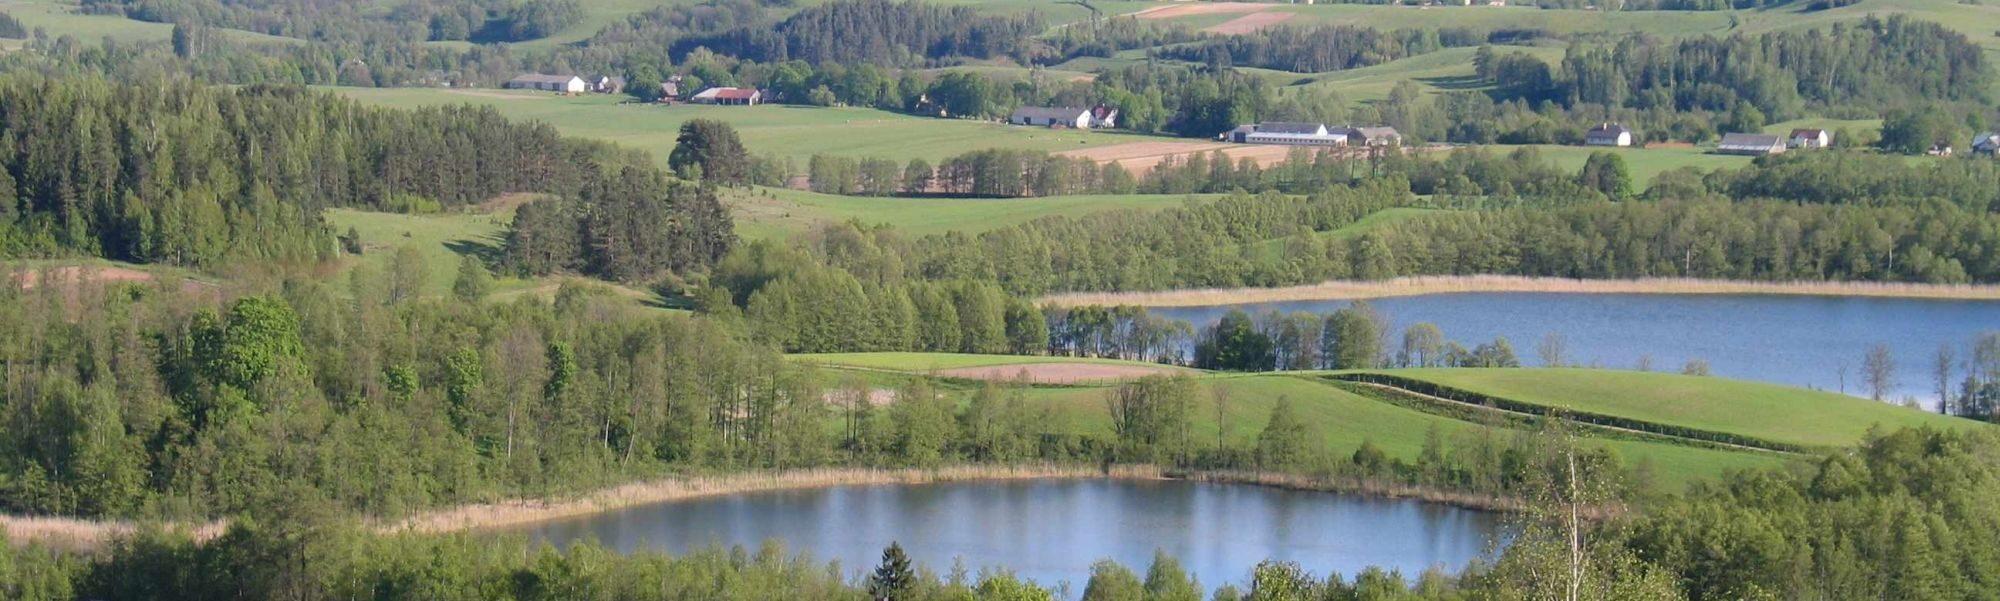 Jezioro Jaczno i Kojle